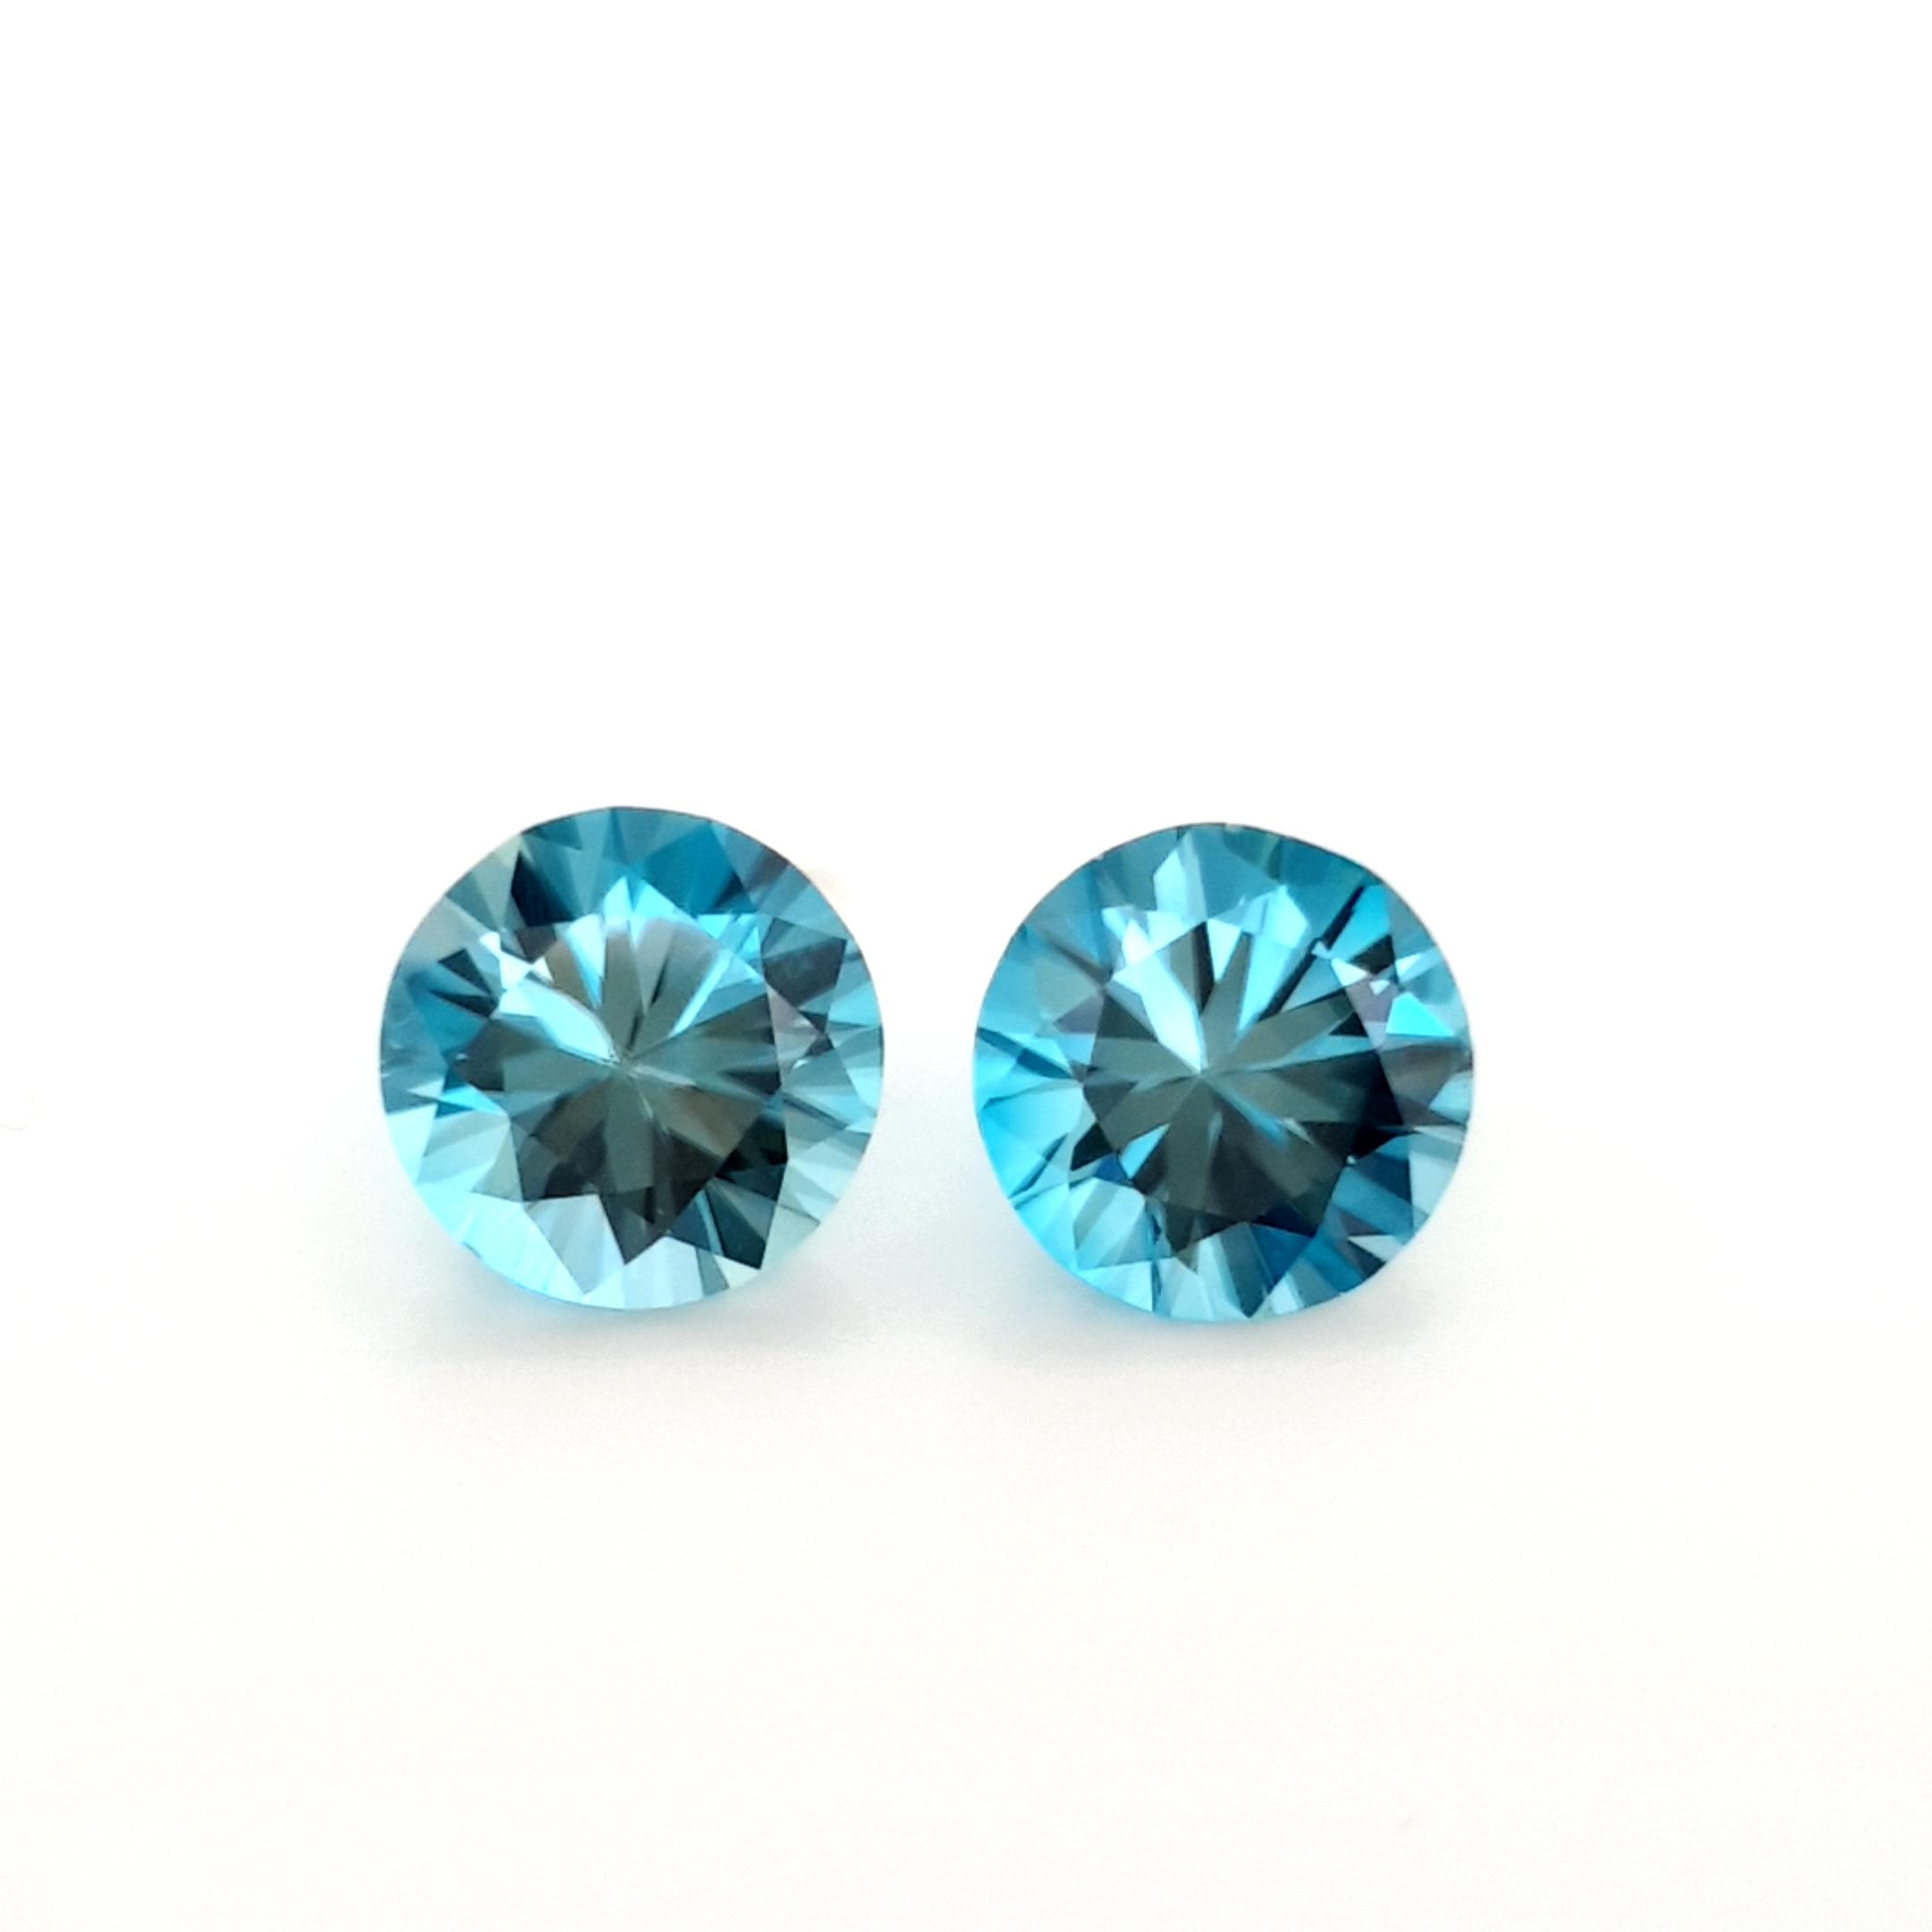 8,05ct. Pair Round9,5mm Starlight Blue Zircon ZCJ19D9 ClaudiaHamann__2021-04-15-17-38-21